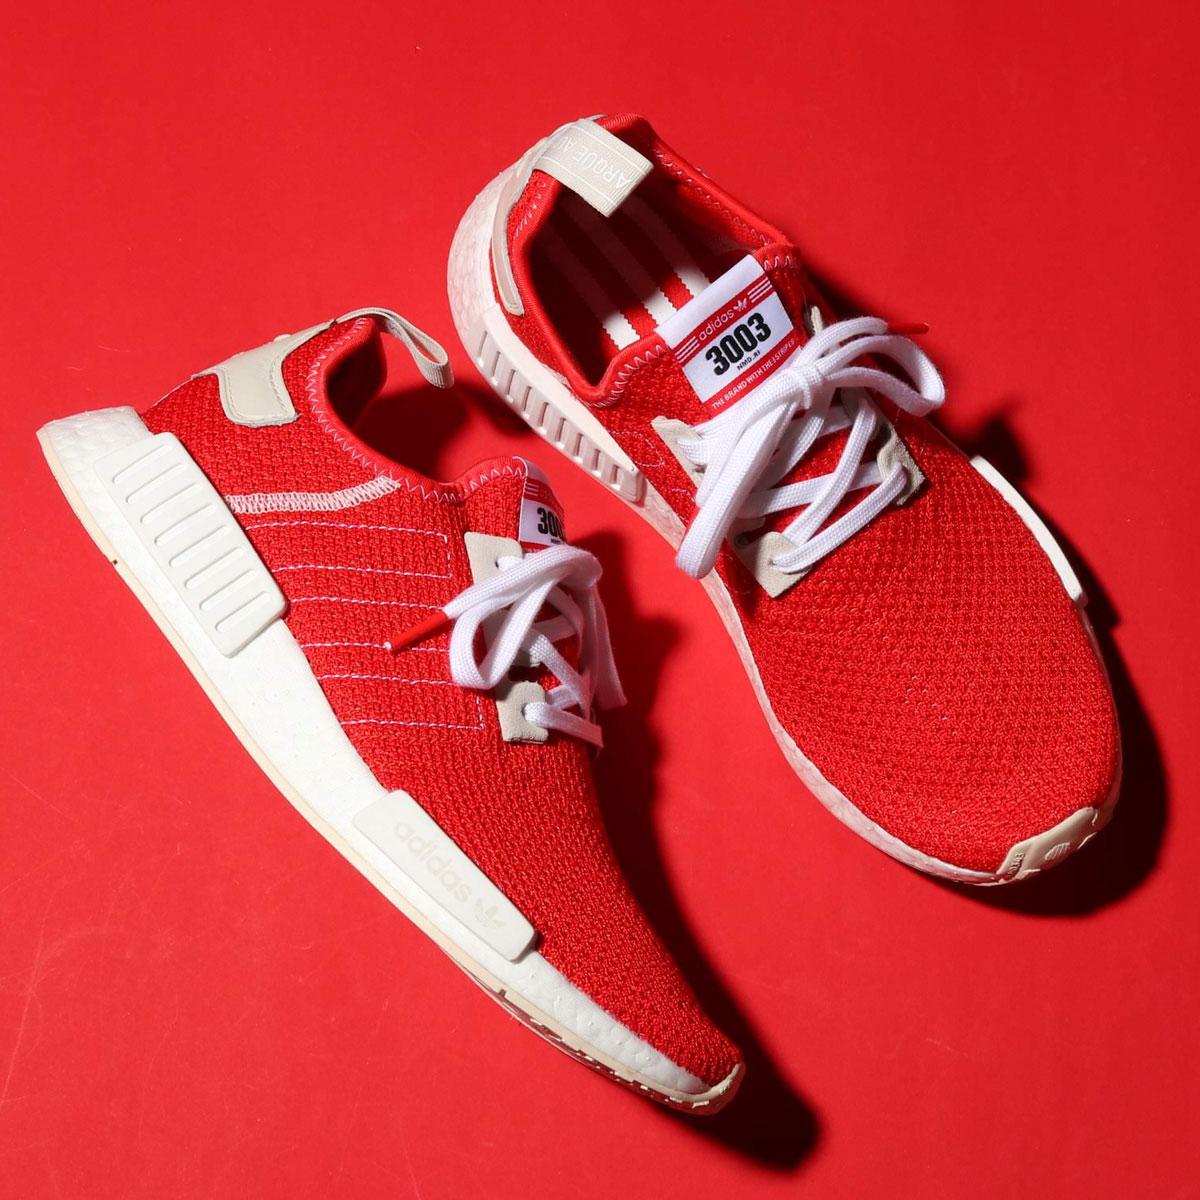 adidas Originals NMD_R1 (アディダスオリジナルス NMD_R1)ACTIVE RED/ACTIVE RED/ECRU TINT S18【メンズ スニーカー】19SS-I